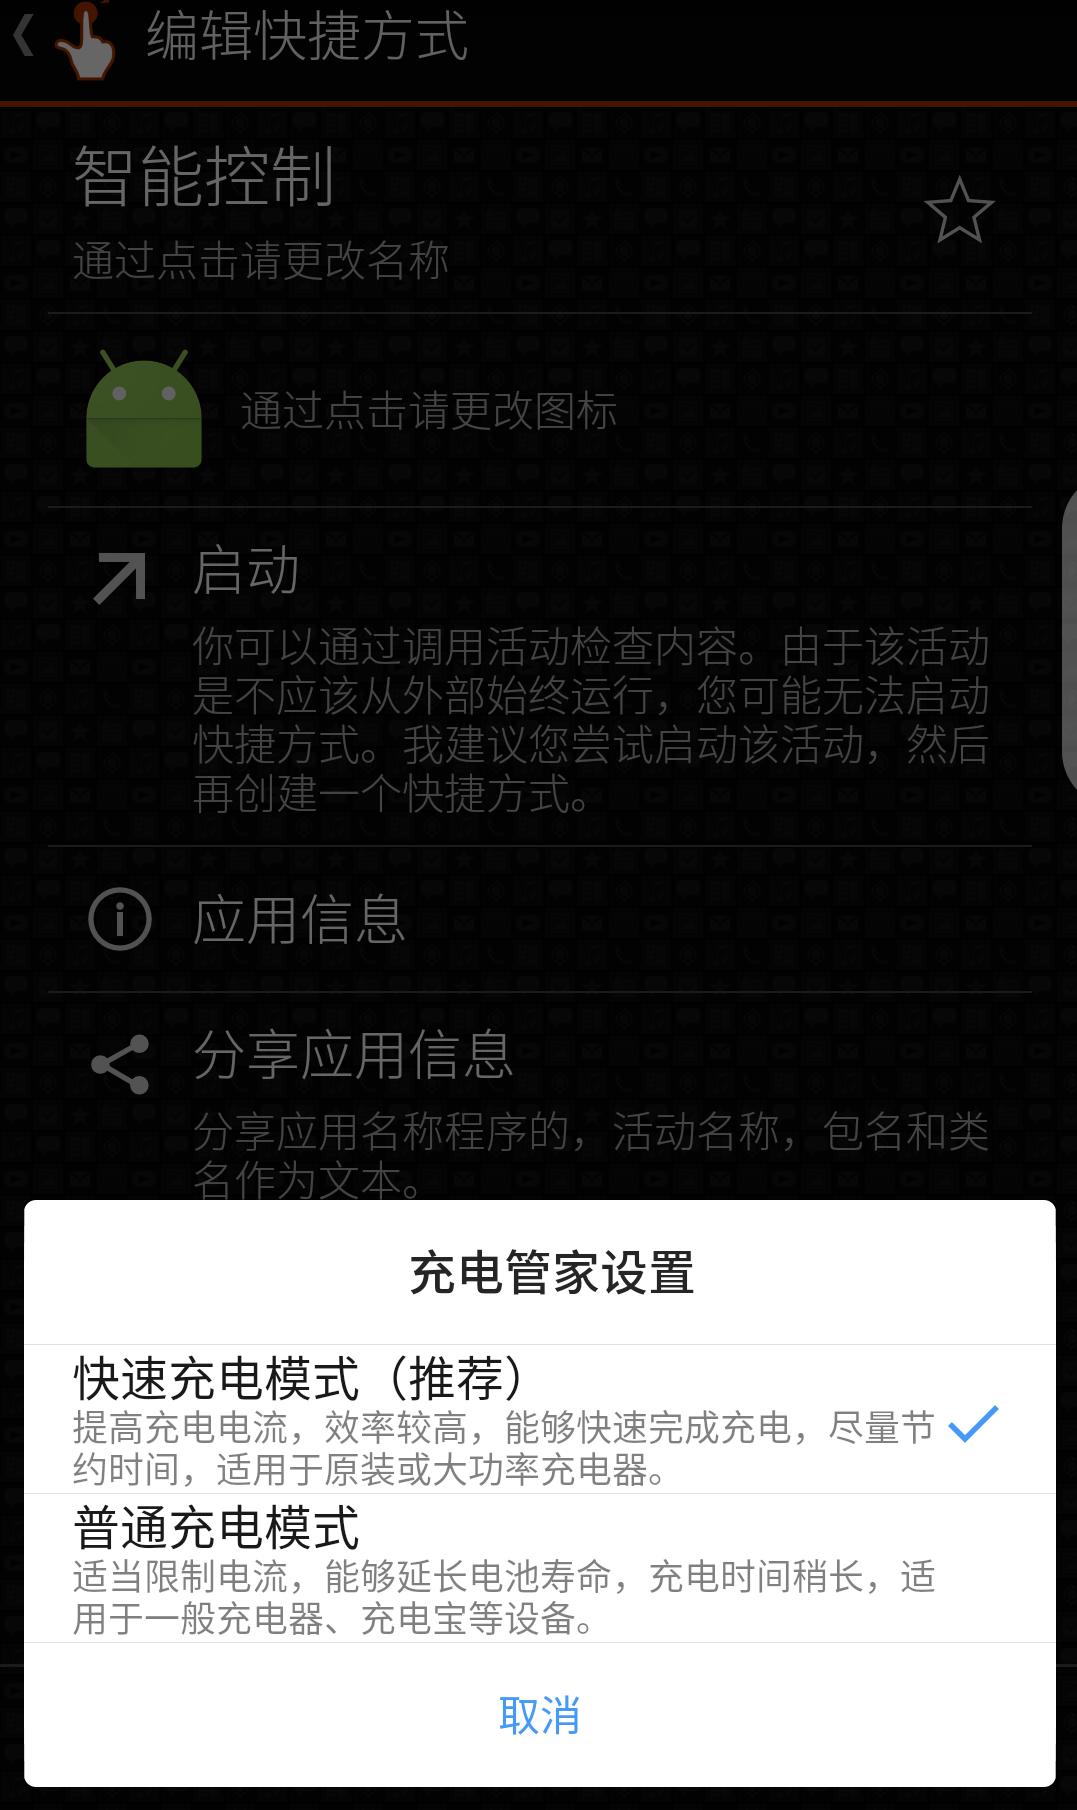 Screenshot_2017-11-12-20-15-08.png